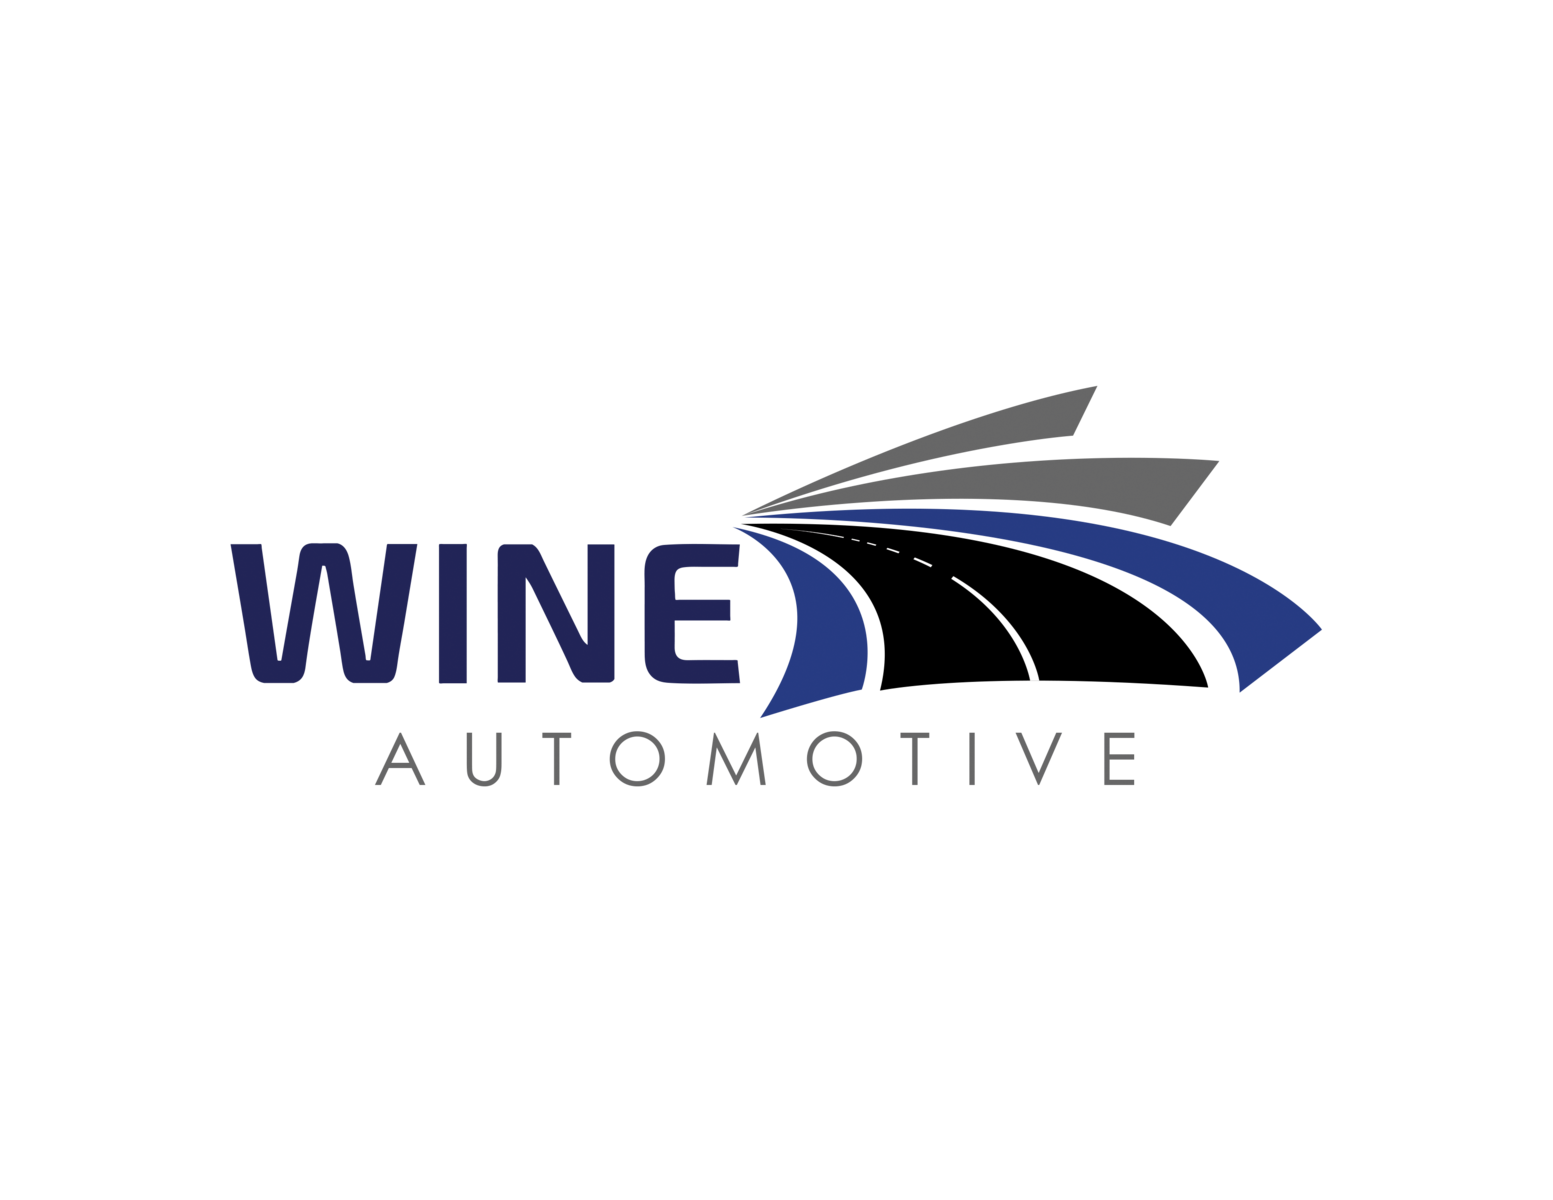 Nissan Dealers In Va >> Wine Automotive - Chesapeake, VA: Read Consumer reviews ...